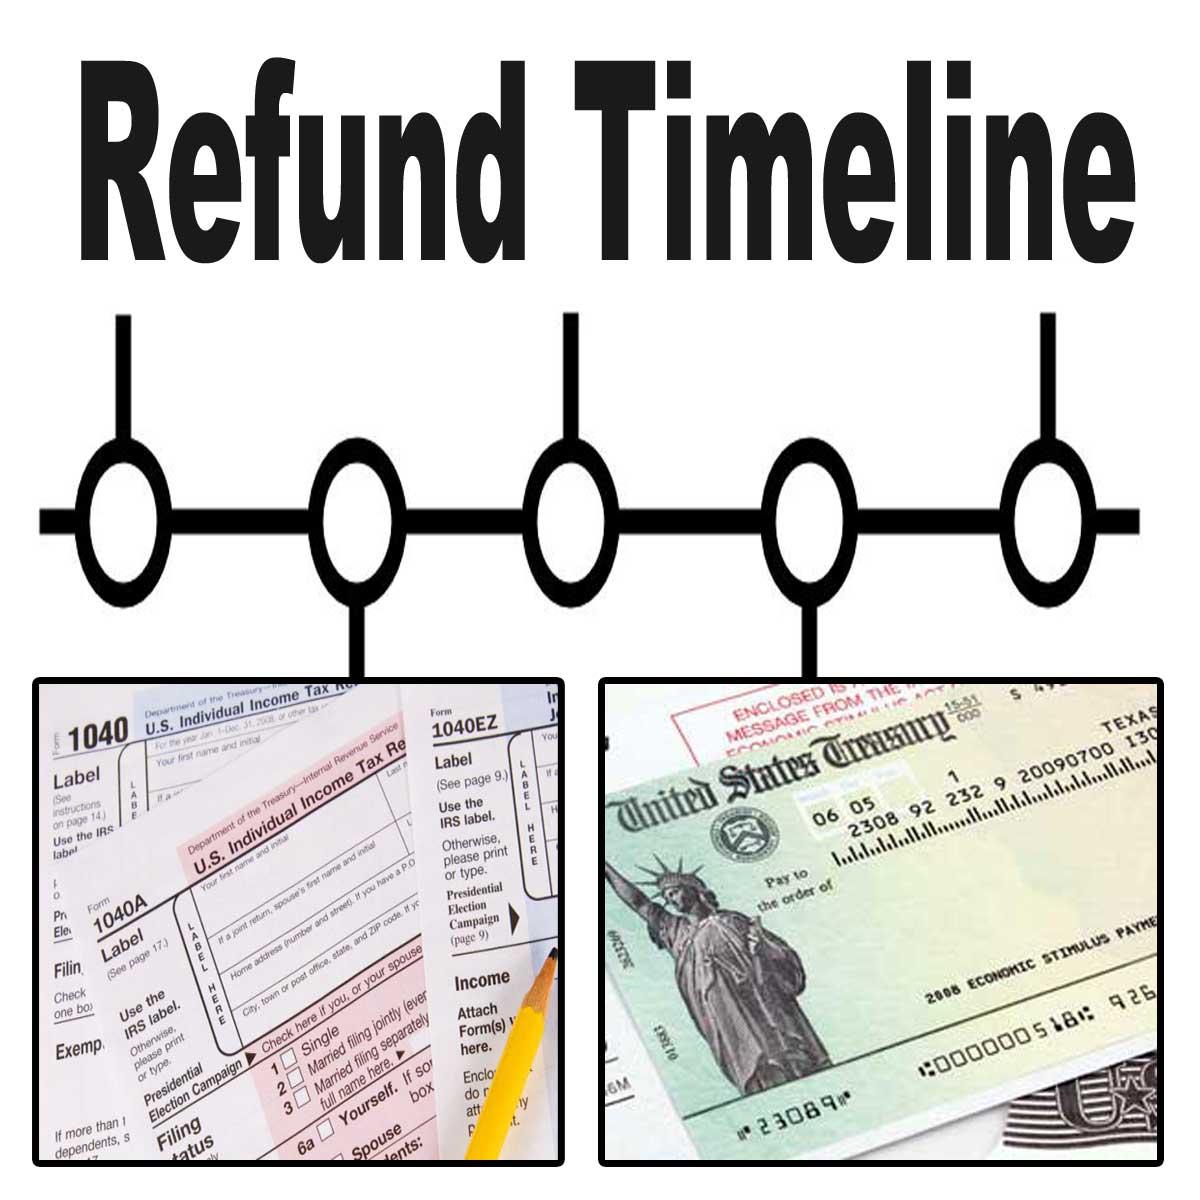 Timeline for 2020 Refunds